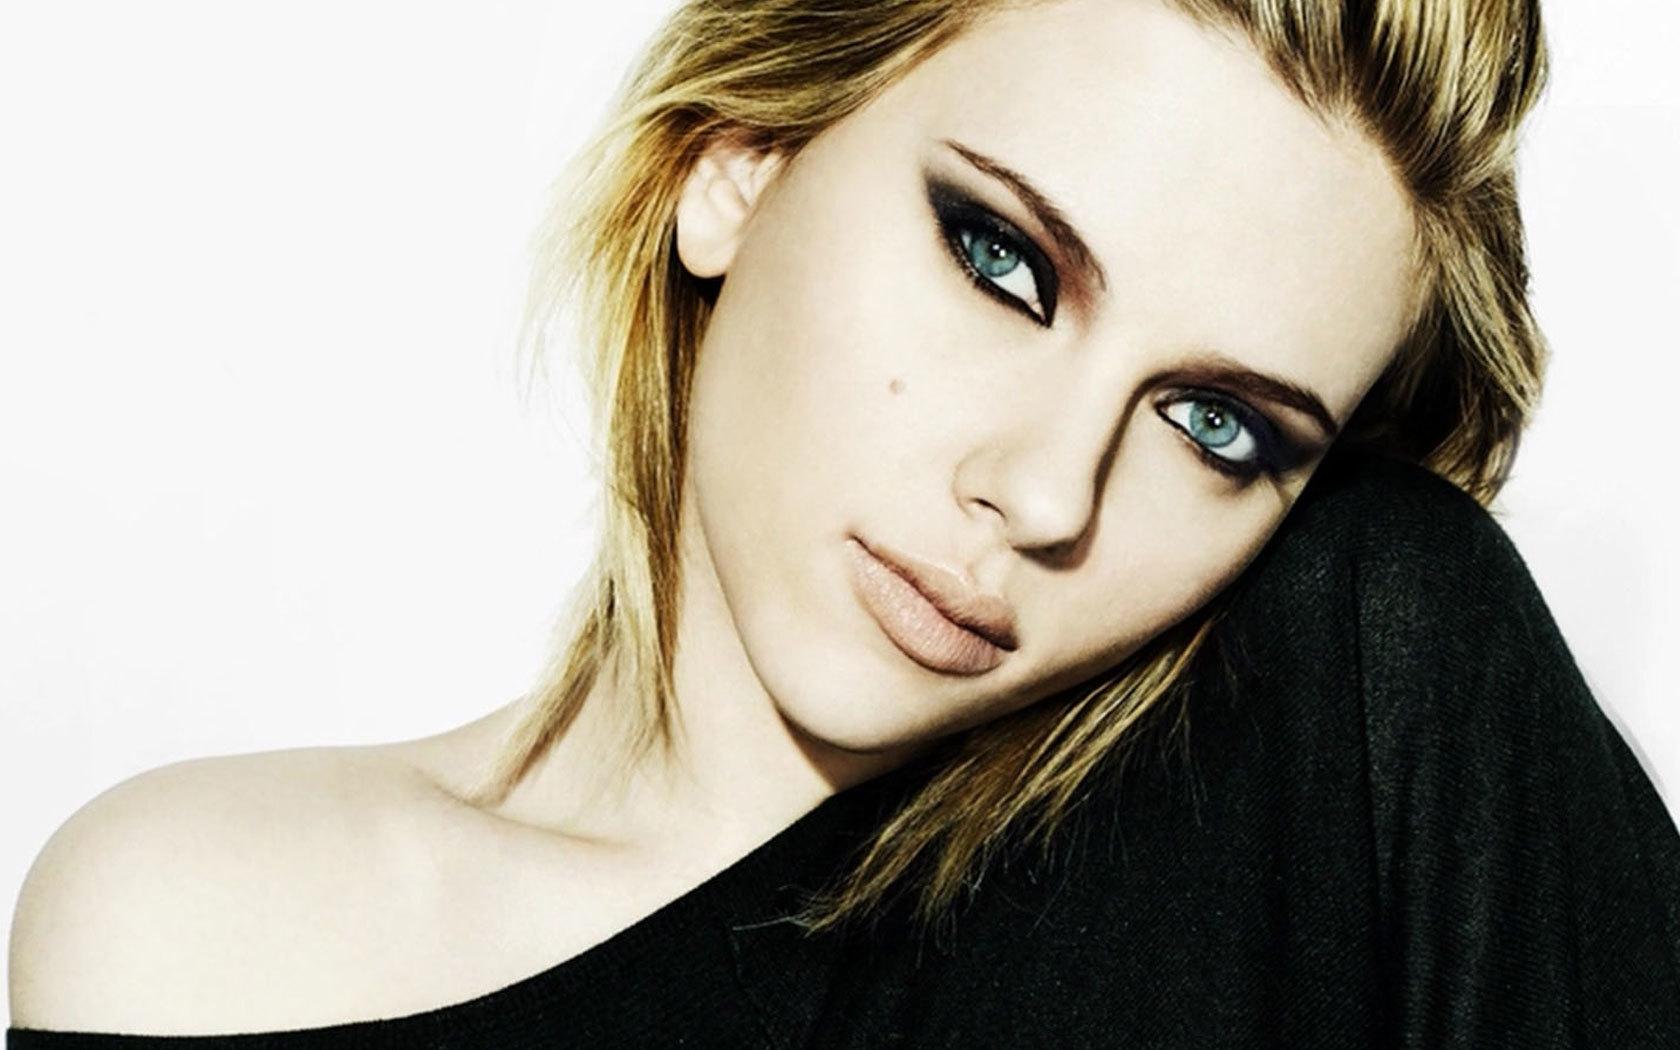 scarlett johansson desktop 1680x1050 wallpaper 163215 - Scarlett Johansson